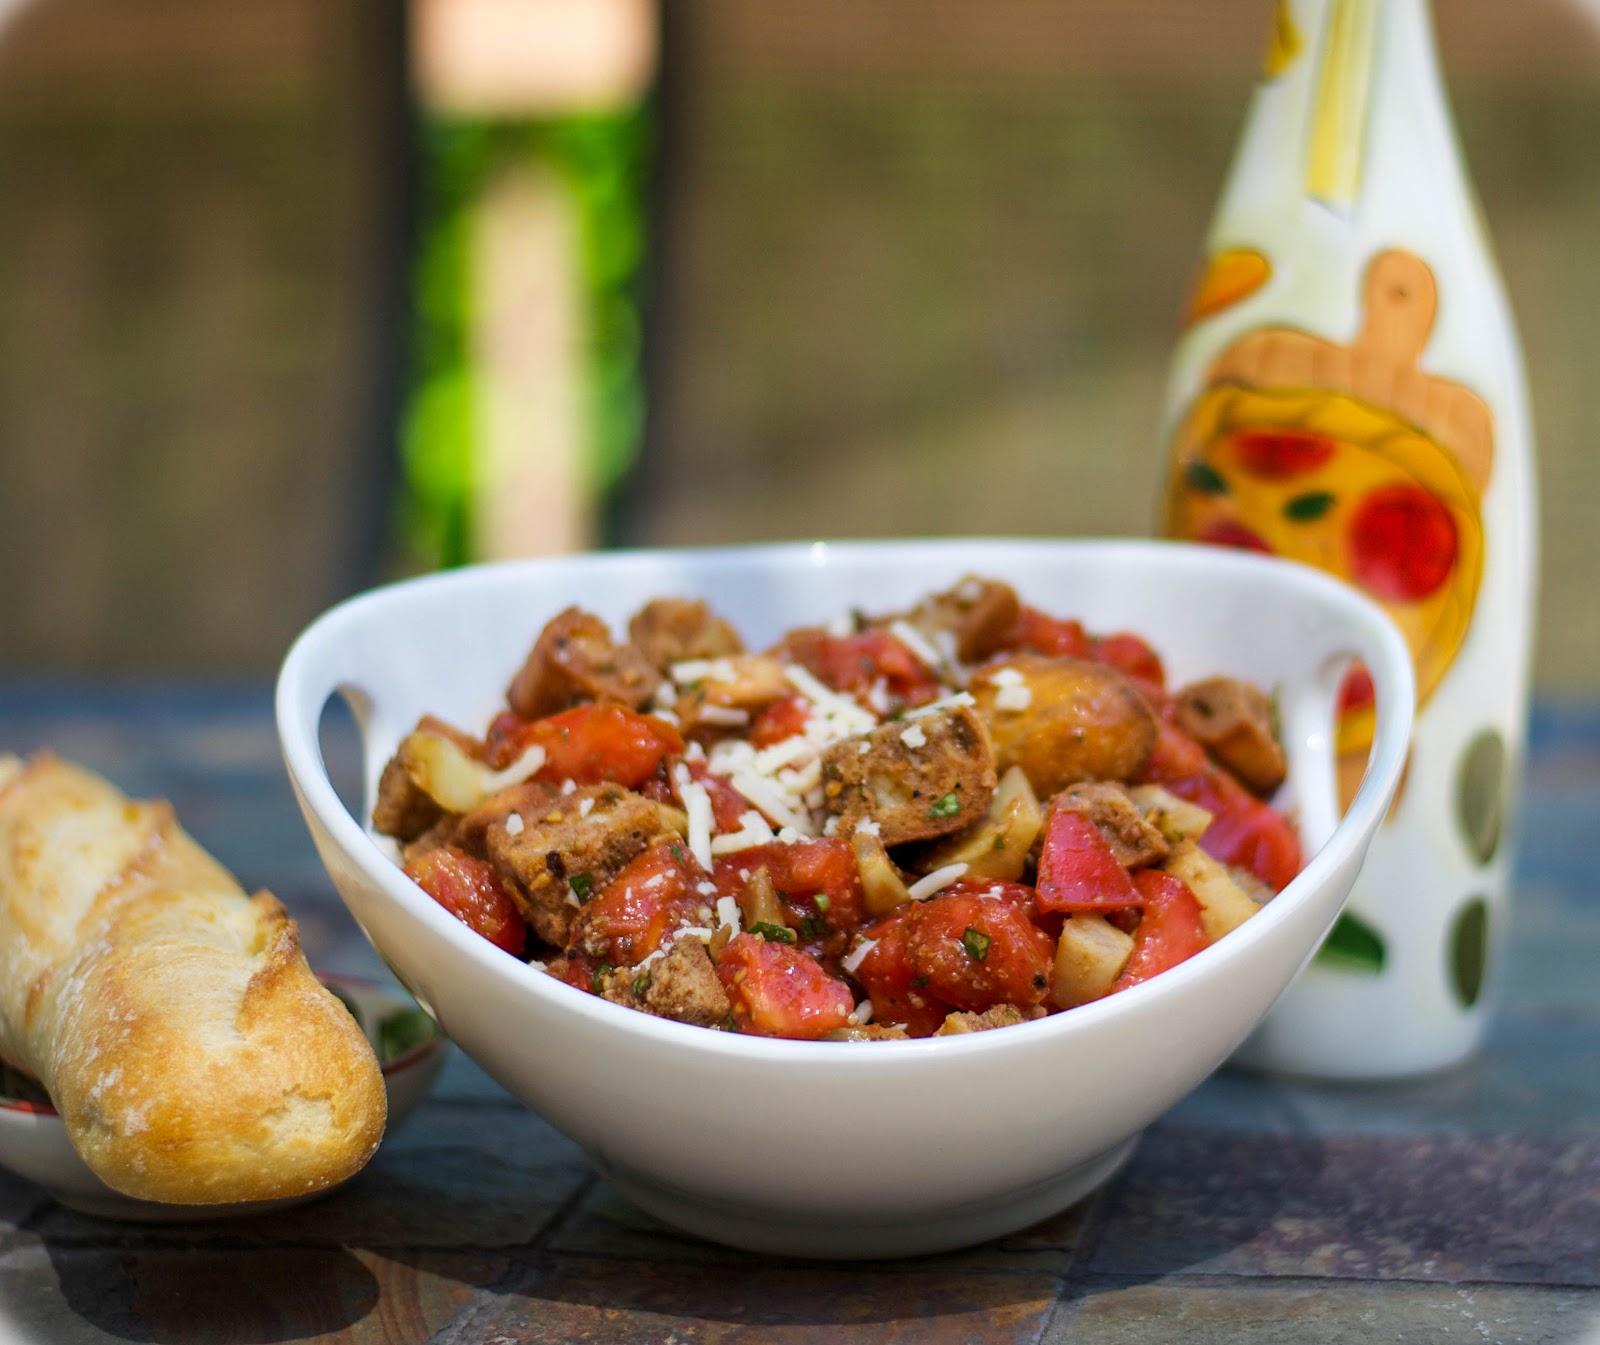 ... Kitchen: Roasted Fennel & Heirloom Tomato Panzanella Salad